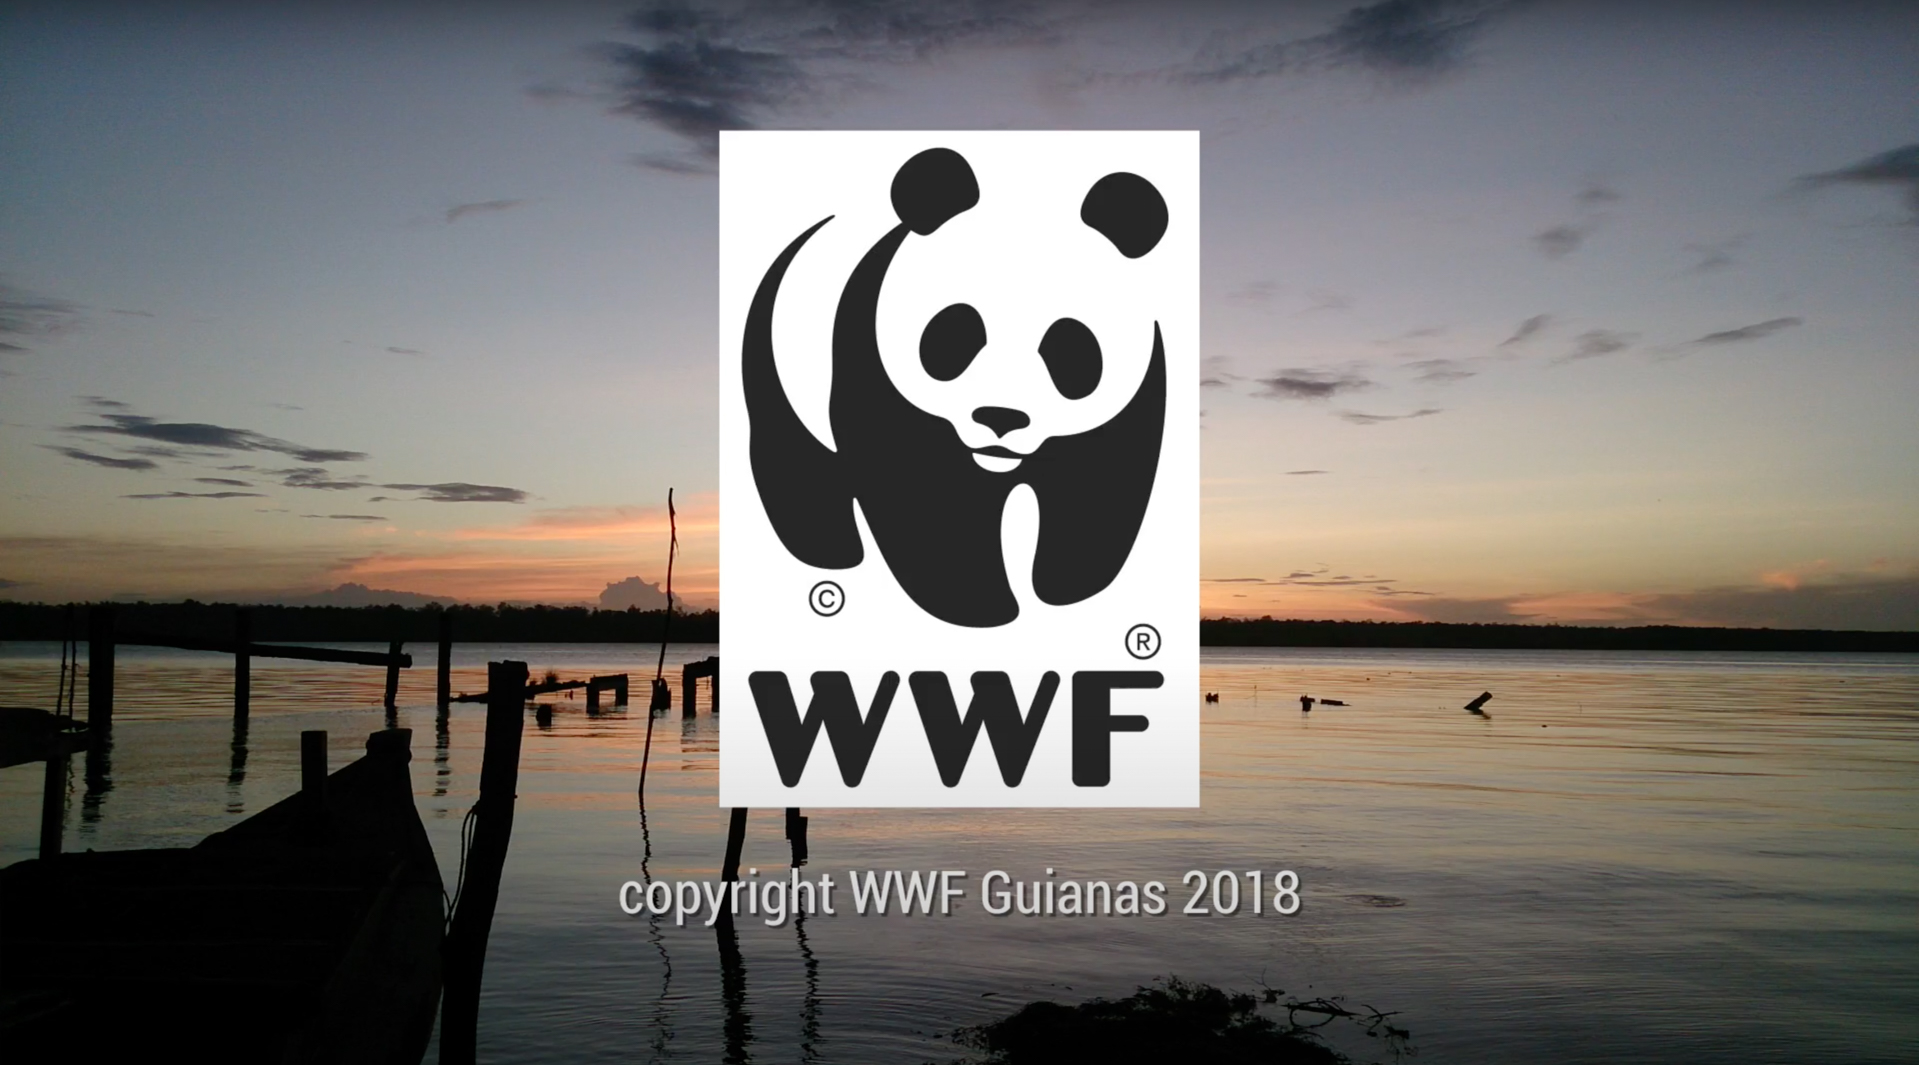 WWF Guianas